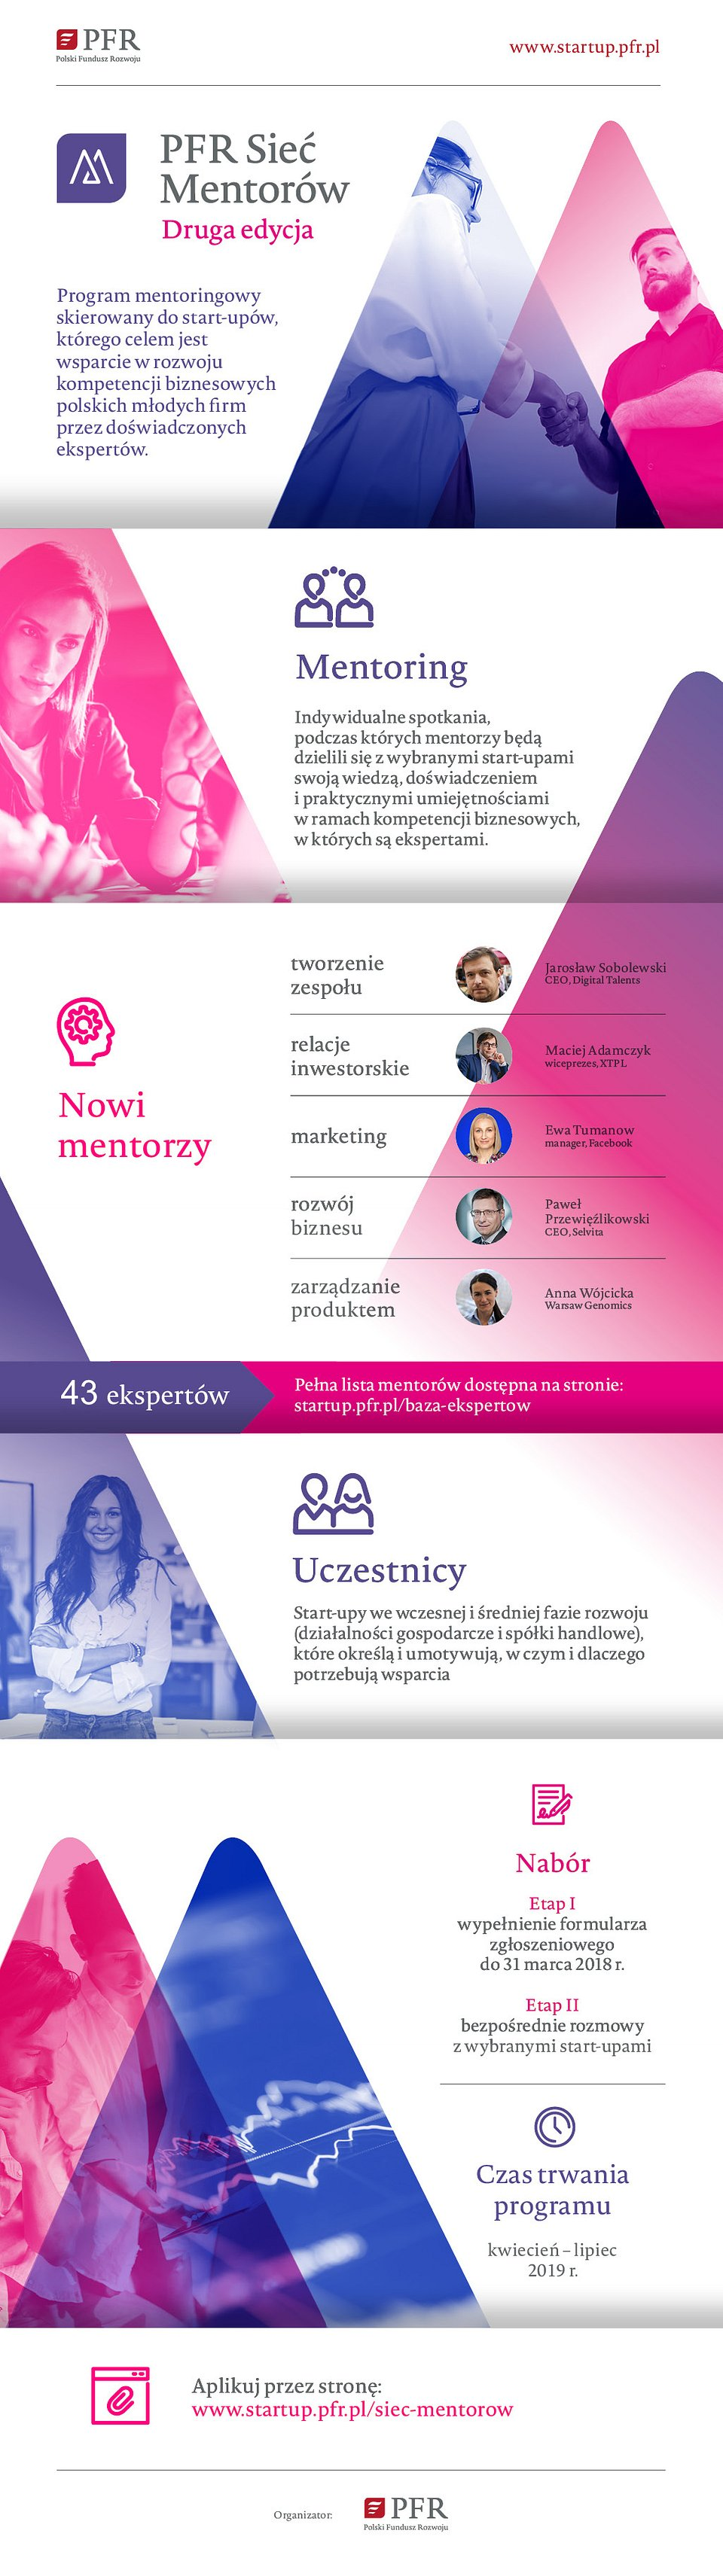 PFR Siec Mentorow infografika 20190226.jpg